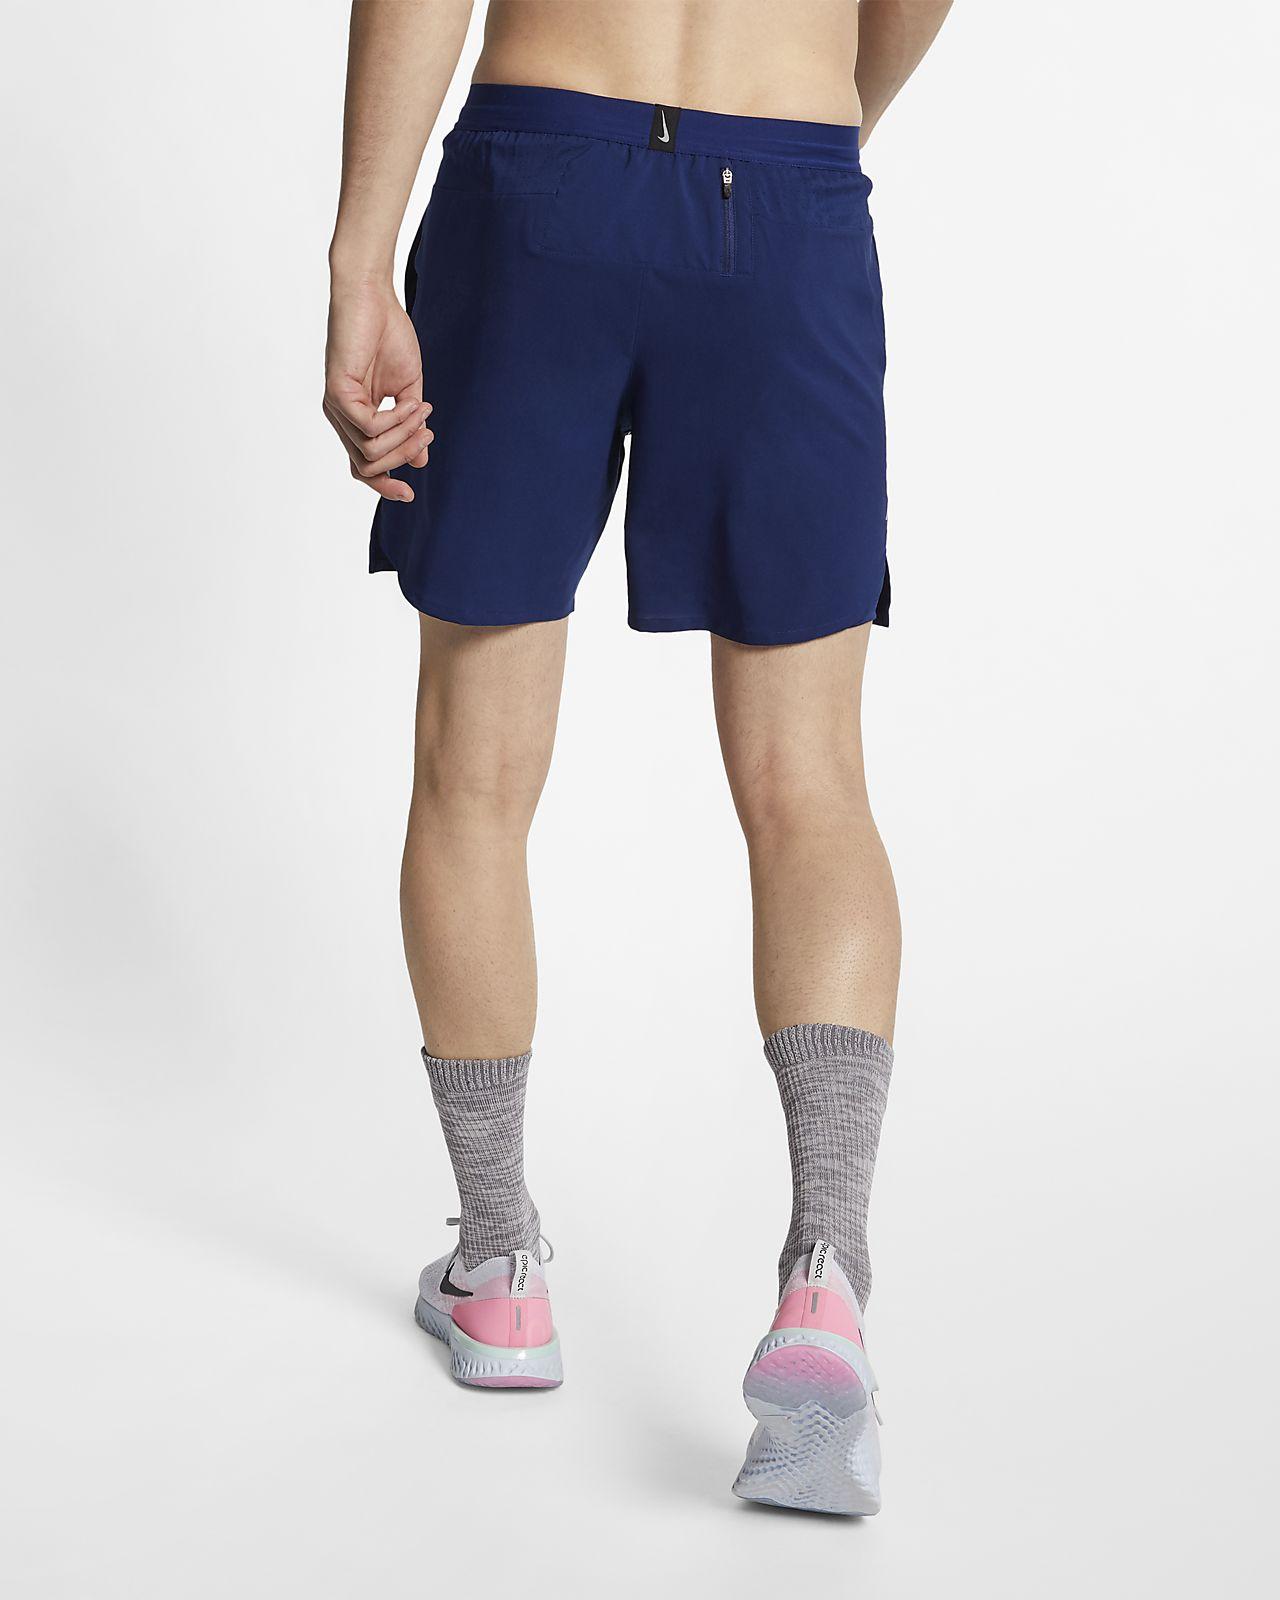 Nike Flex Stride 2 in 1 bei